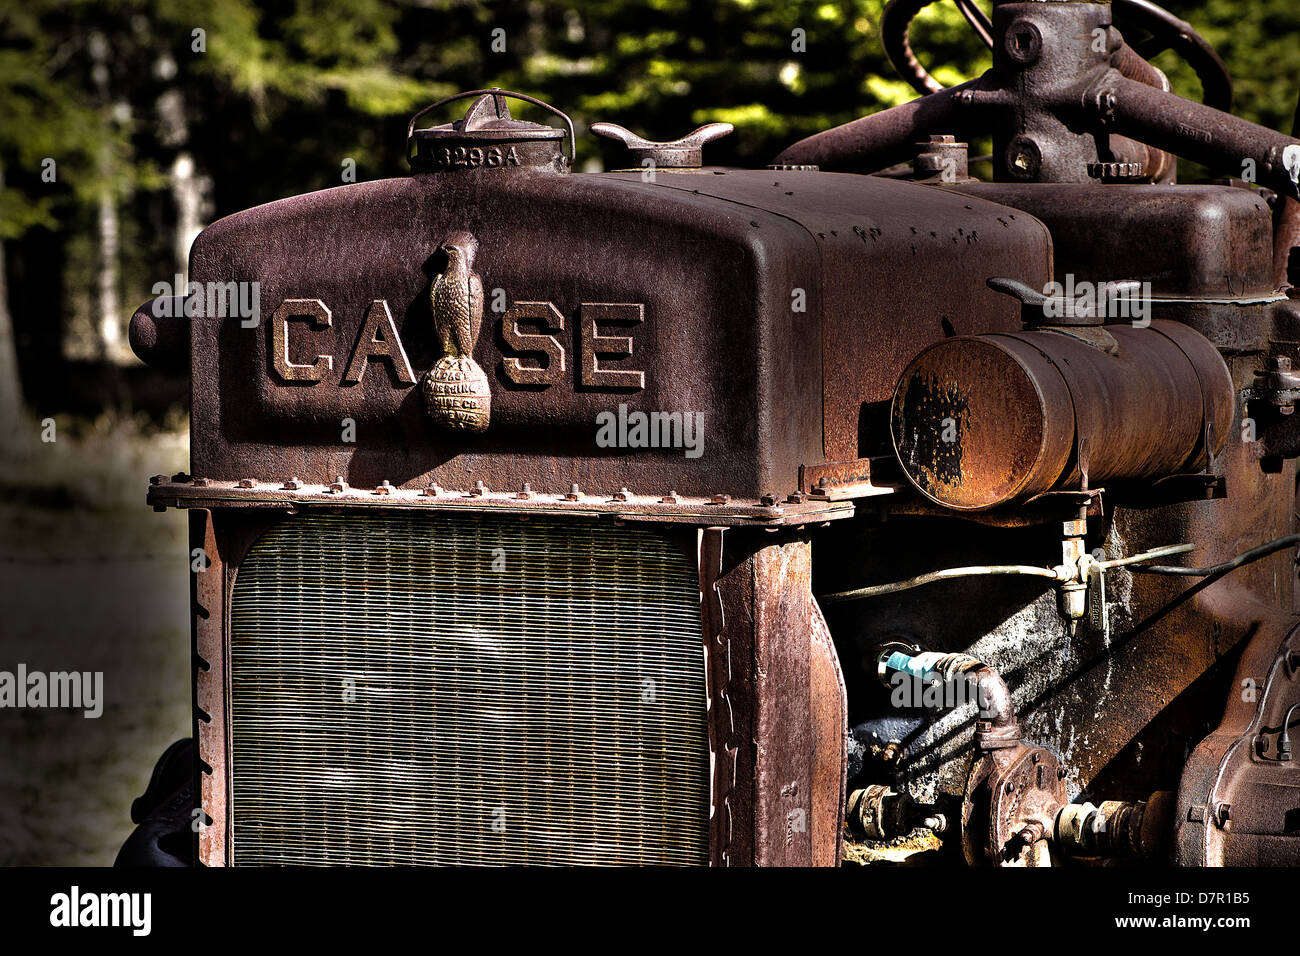 Fall, Traktor, Geräte, landwirtschaftliche Geräte. Jerome I. Fall, J.I Fall Dreschmaschine Company, Fall. Stockbild